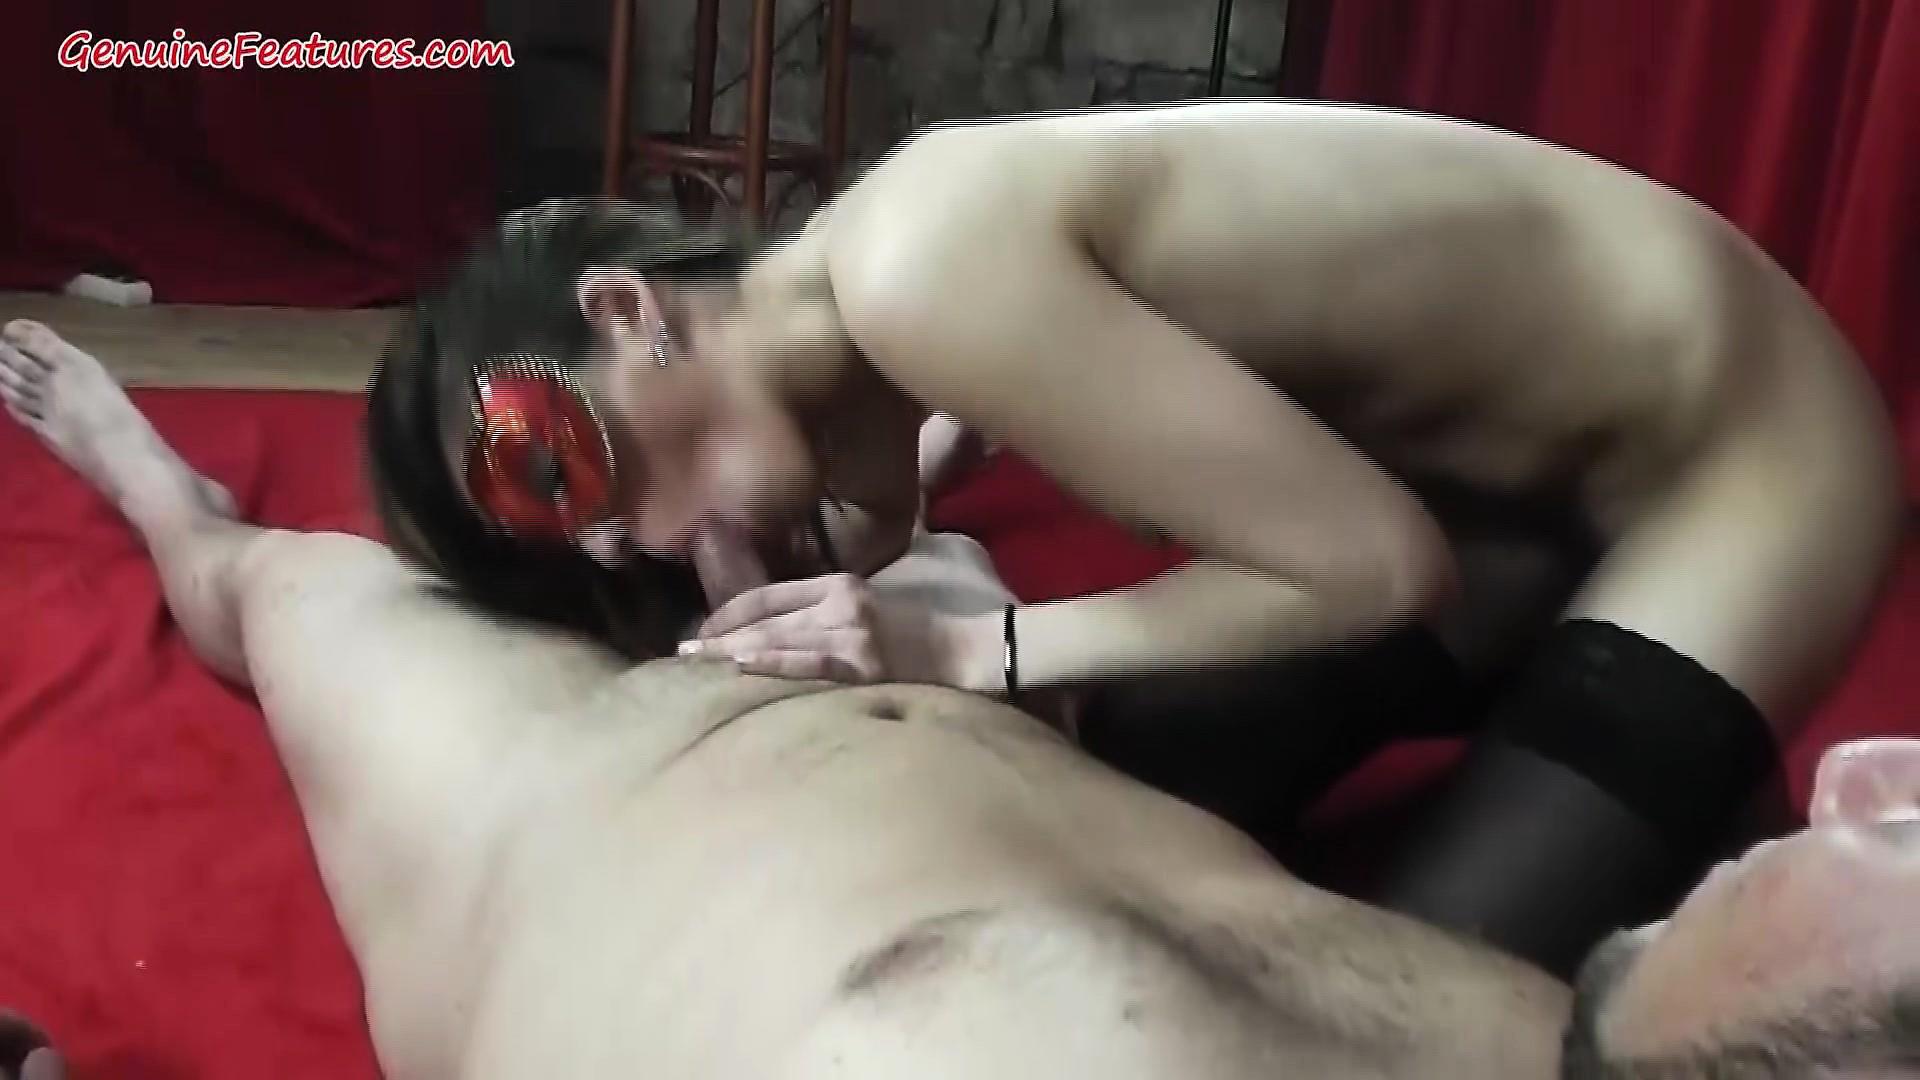 Секс чешской брюнетки на работе 14 фотография